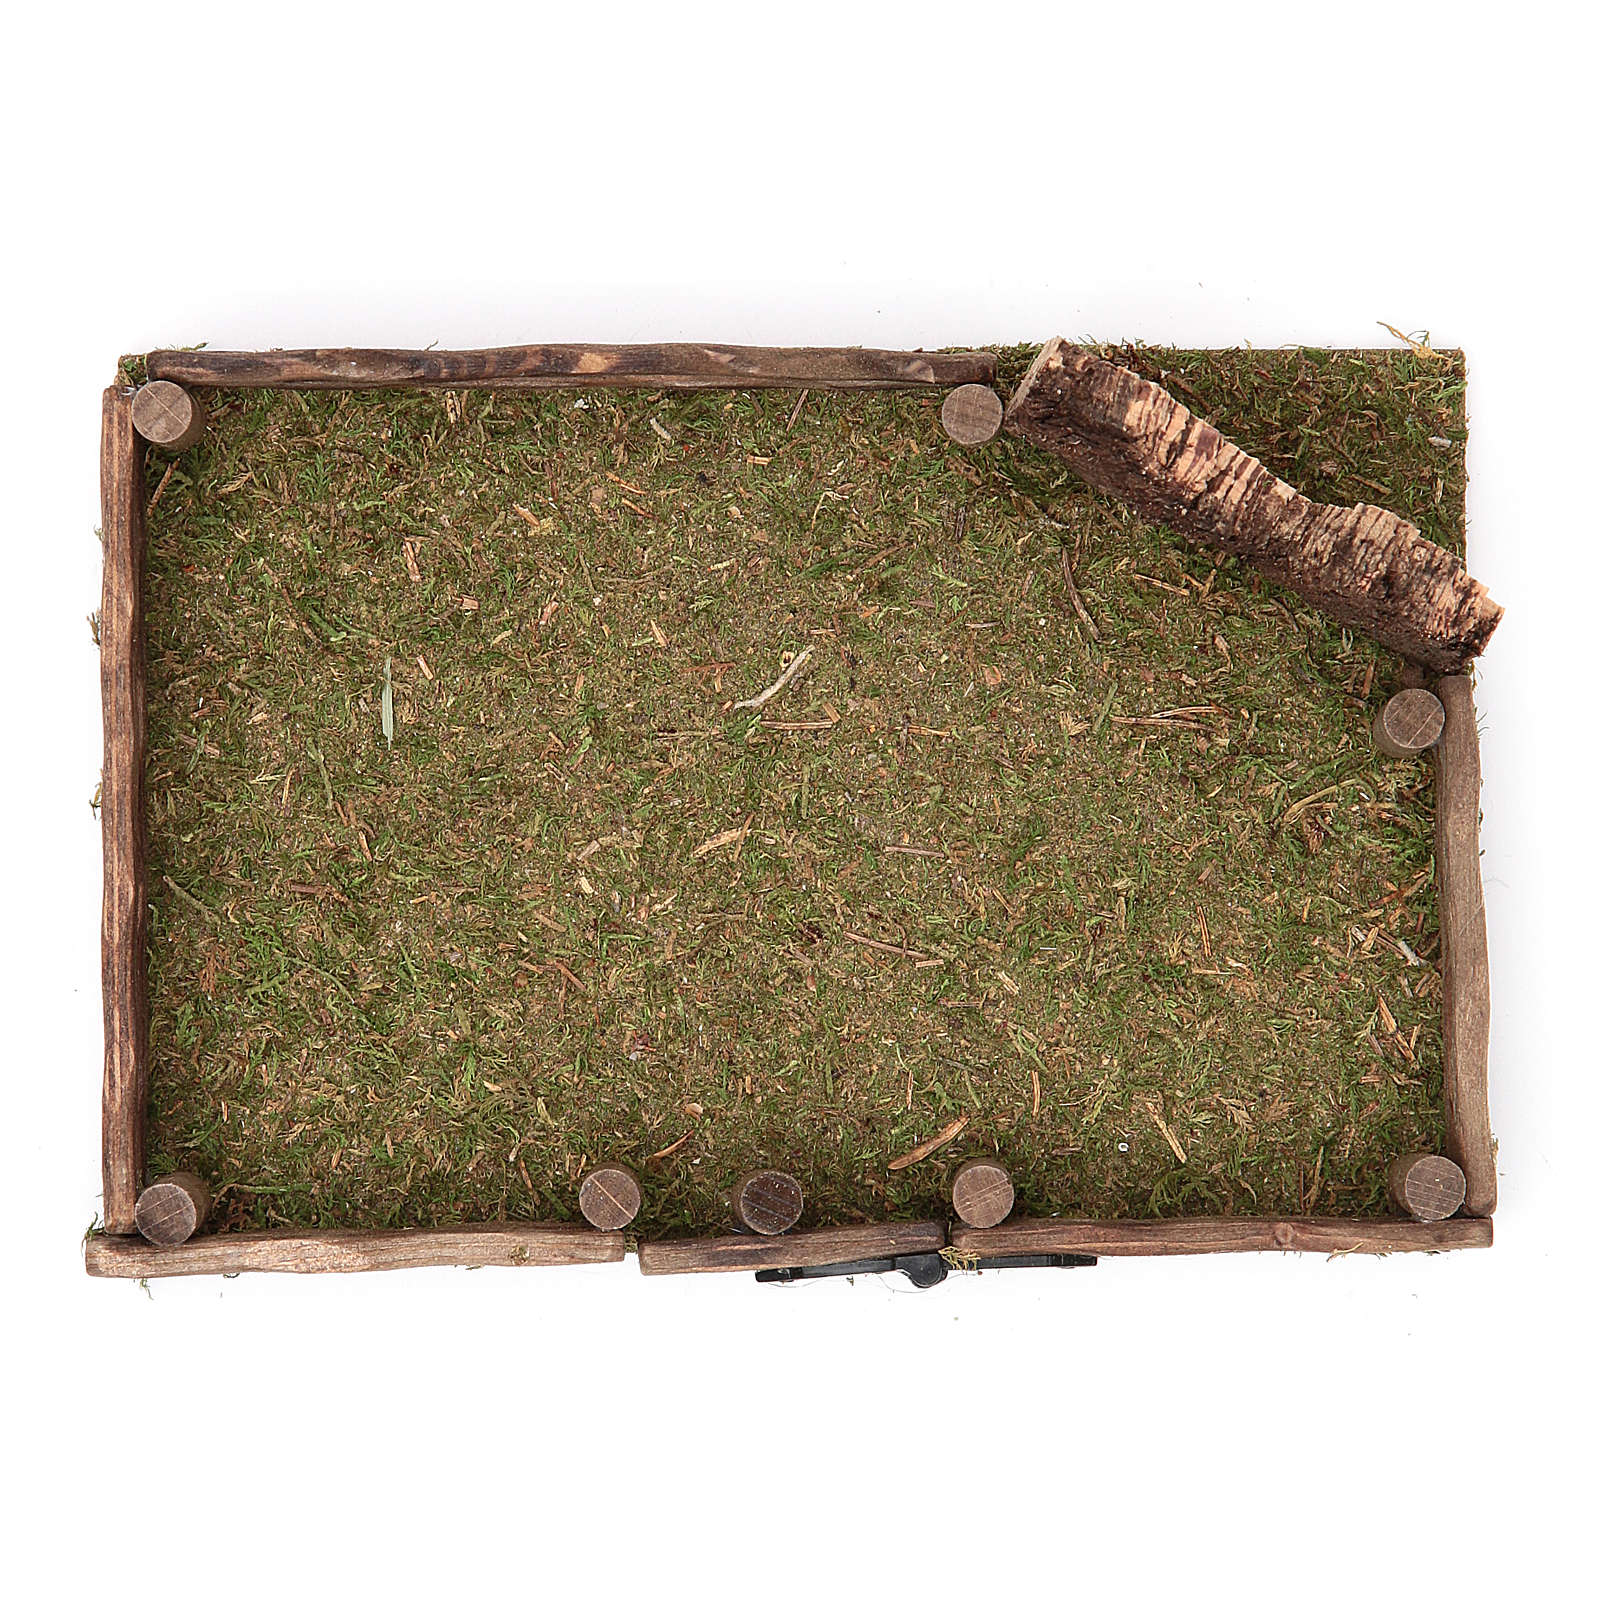 Corral de madera belén 12x18 cm 4